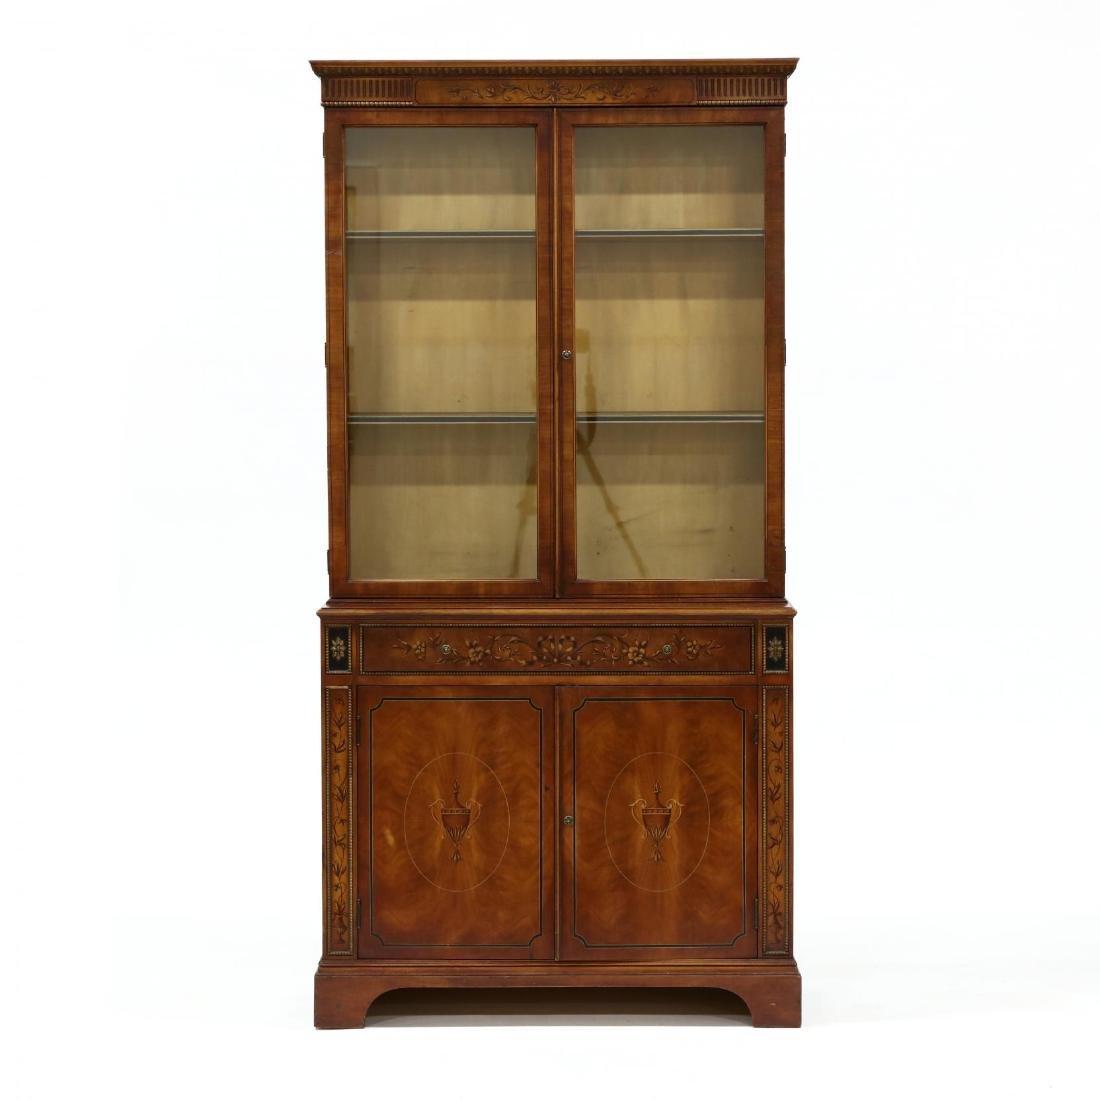 Kindel, Italianate Paint Decorated China Cabinet